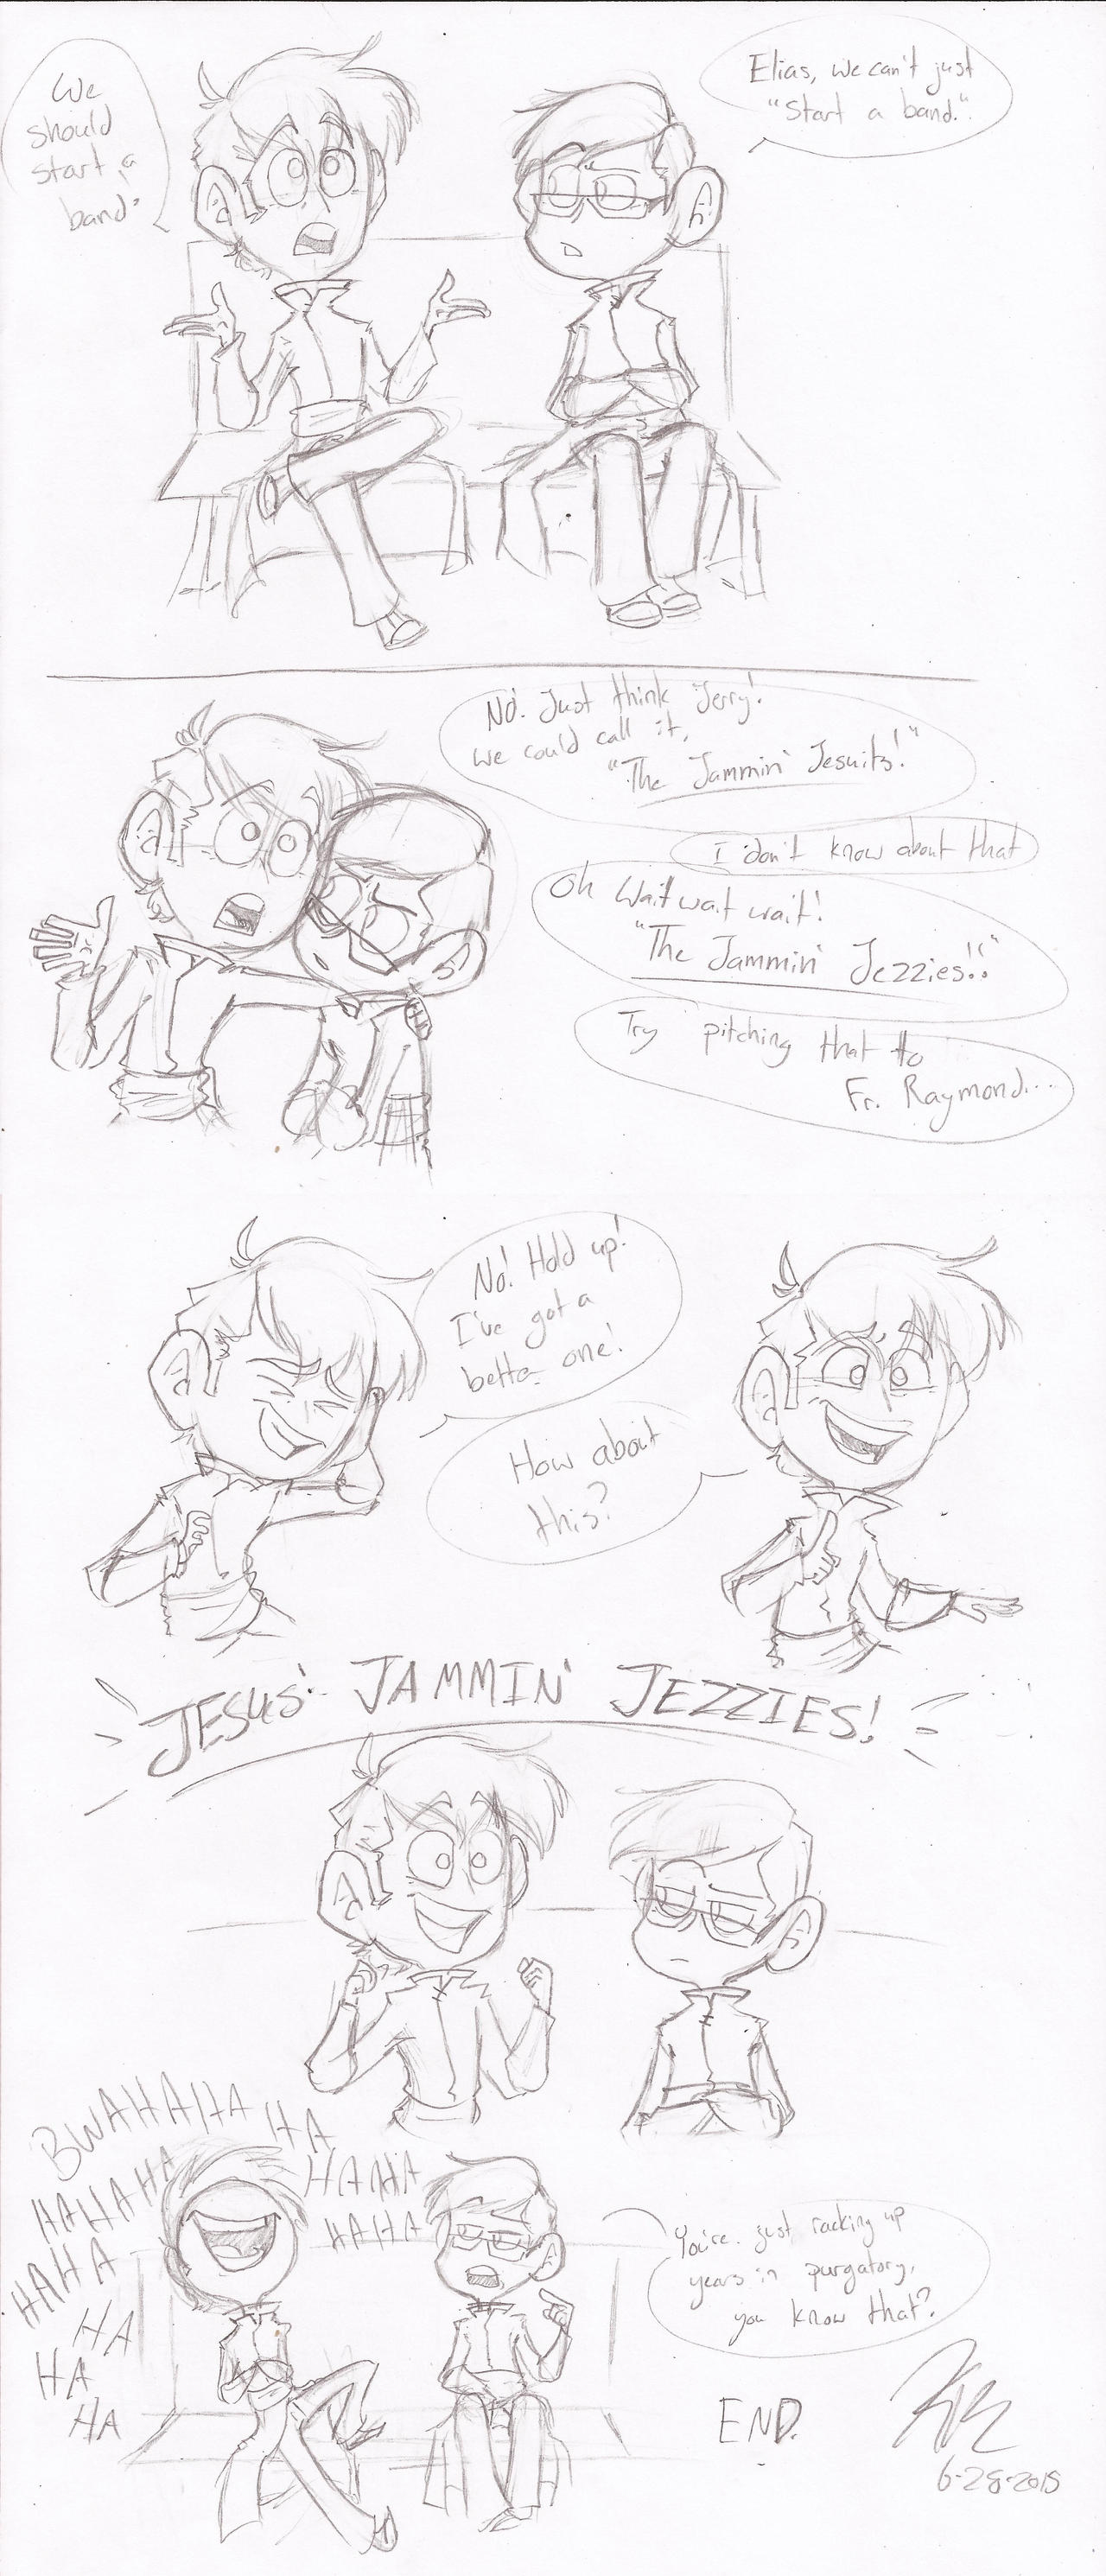 Jesus' Jammin' Jezzies by HugaDuck